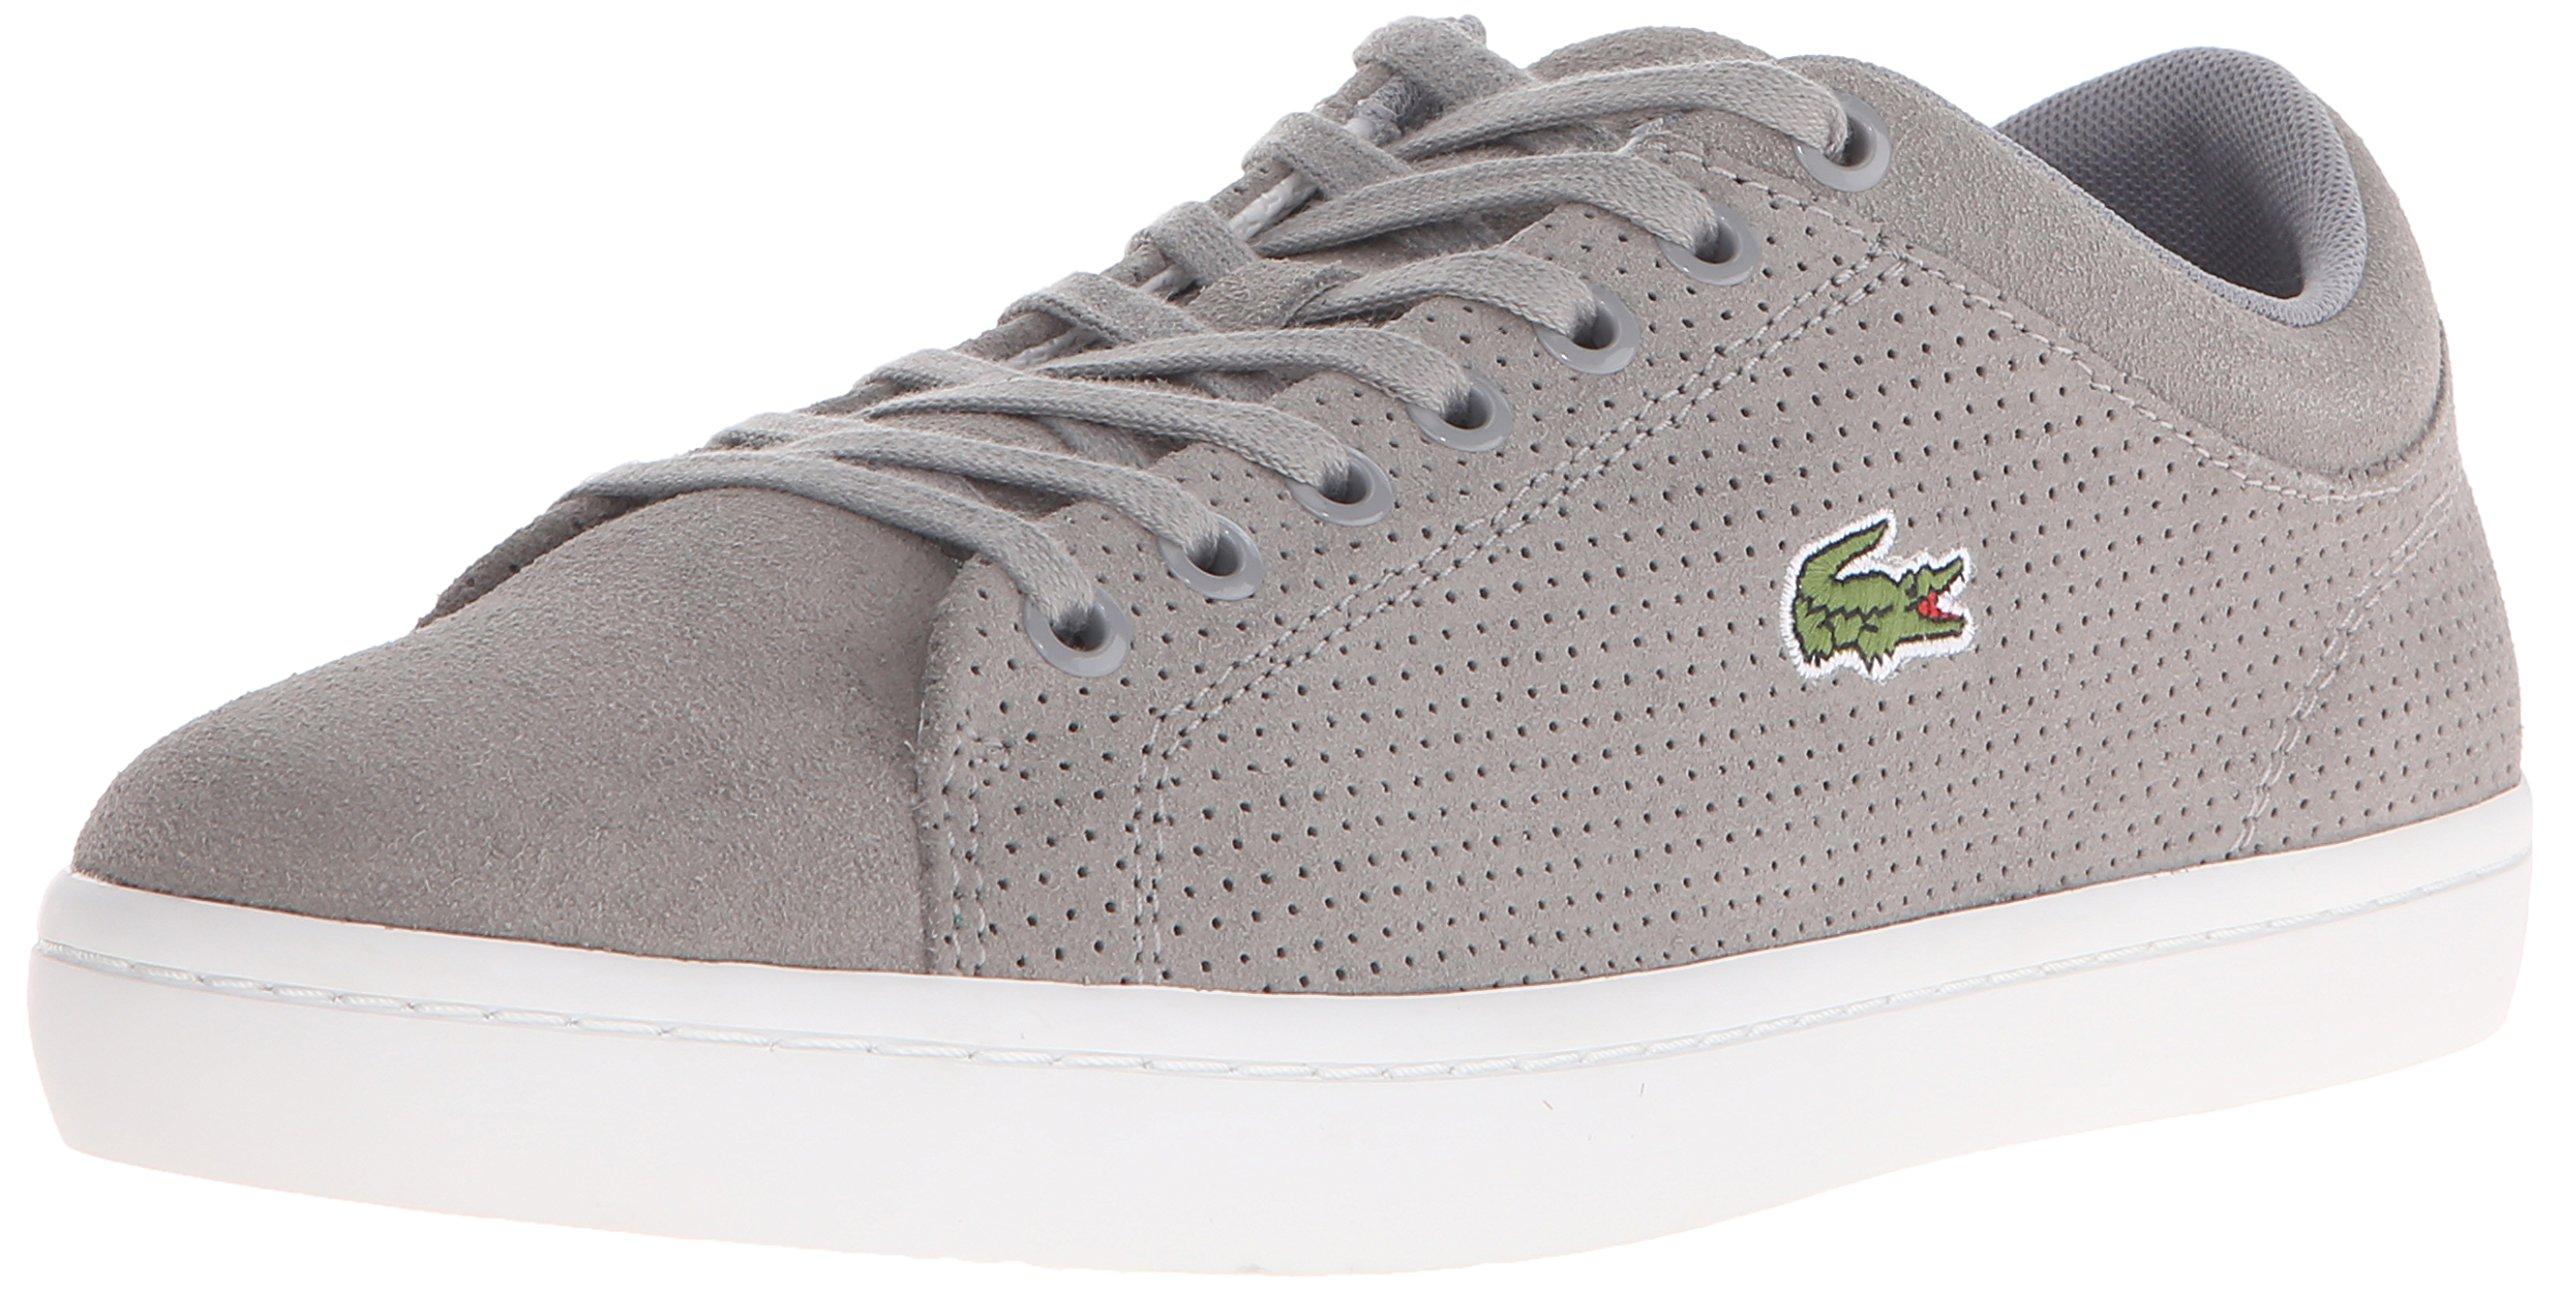 Lacoste Men's Straightset SPT 1162 Fashion Sneaker, Grey, 9 M US